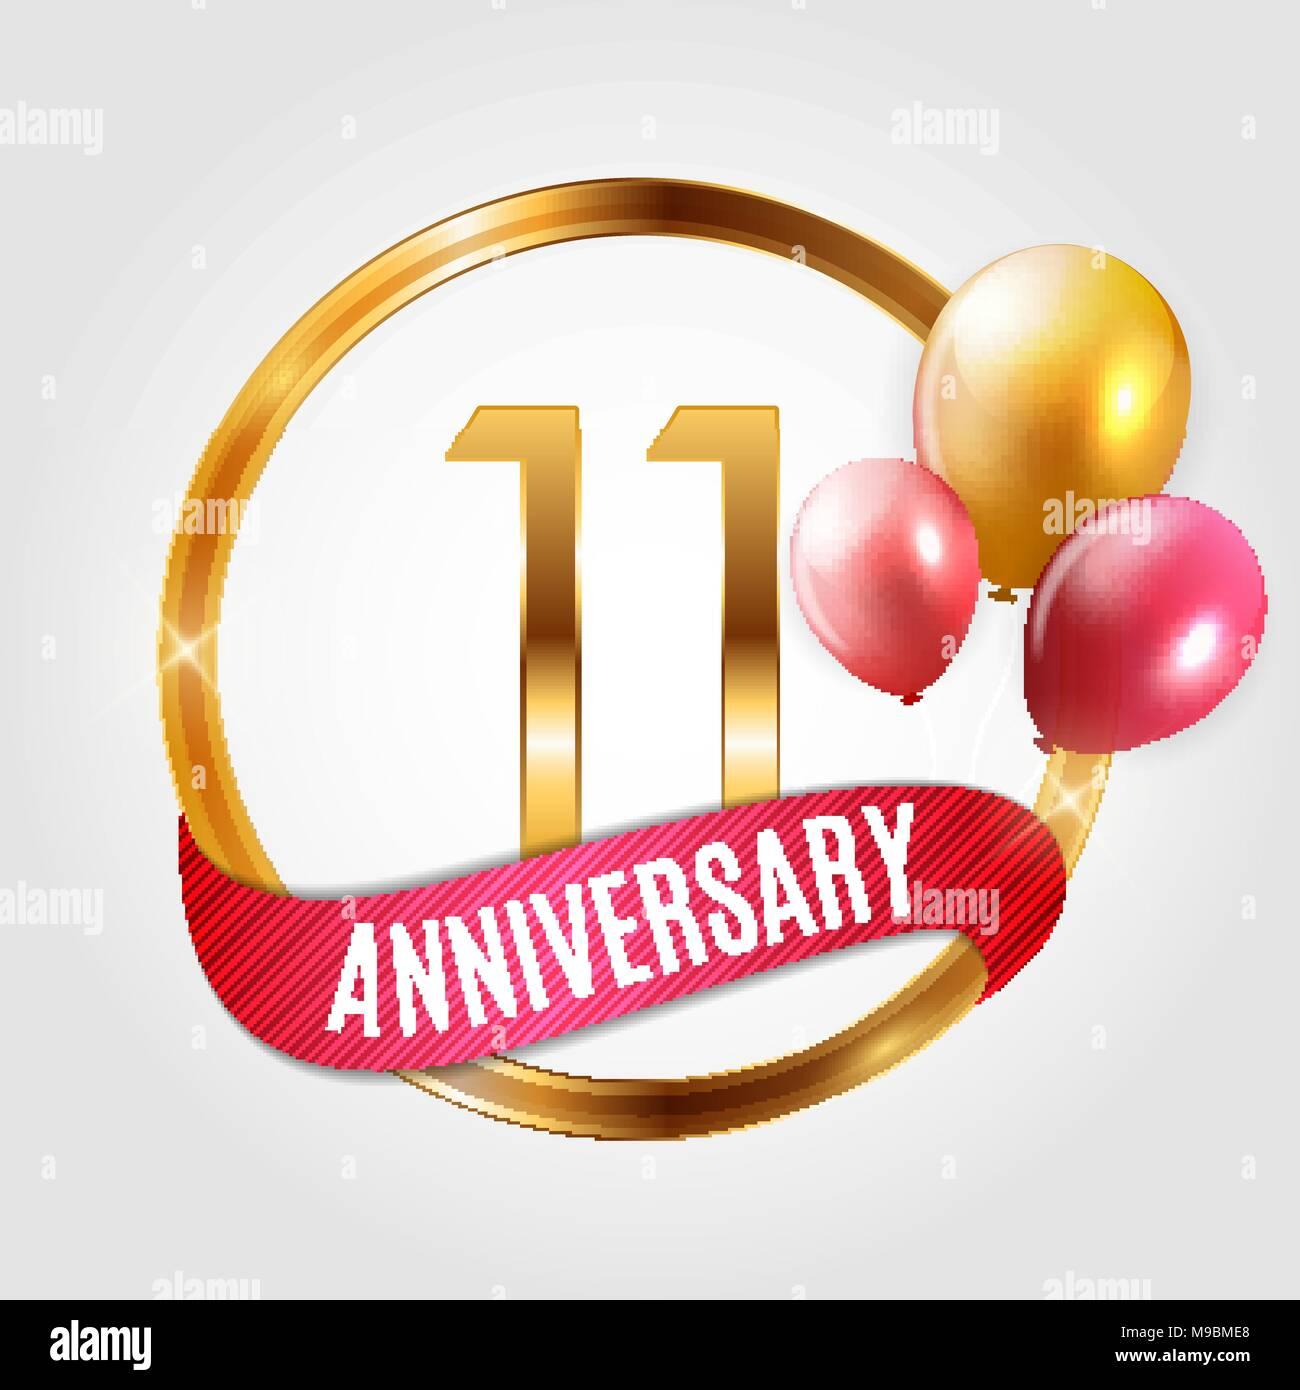 11 Anniversario Di Matrimonio.Template Gold Logo 11 Years Anniversary With Ribbon And Balloons